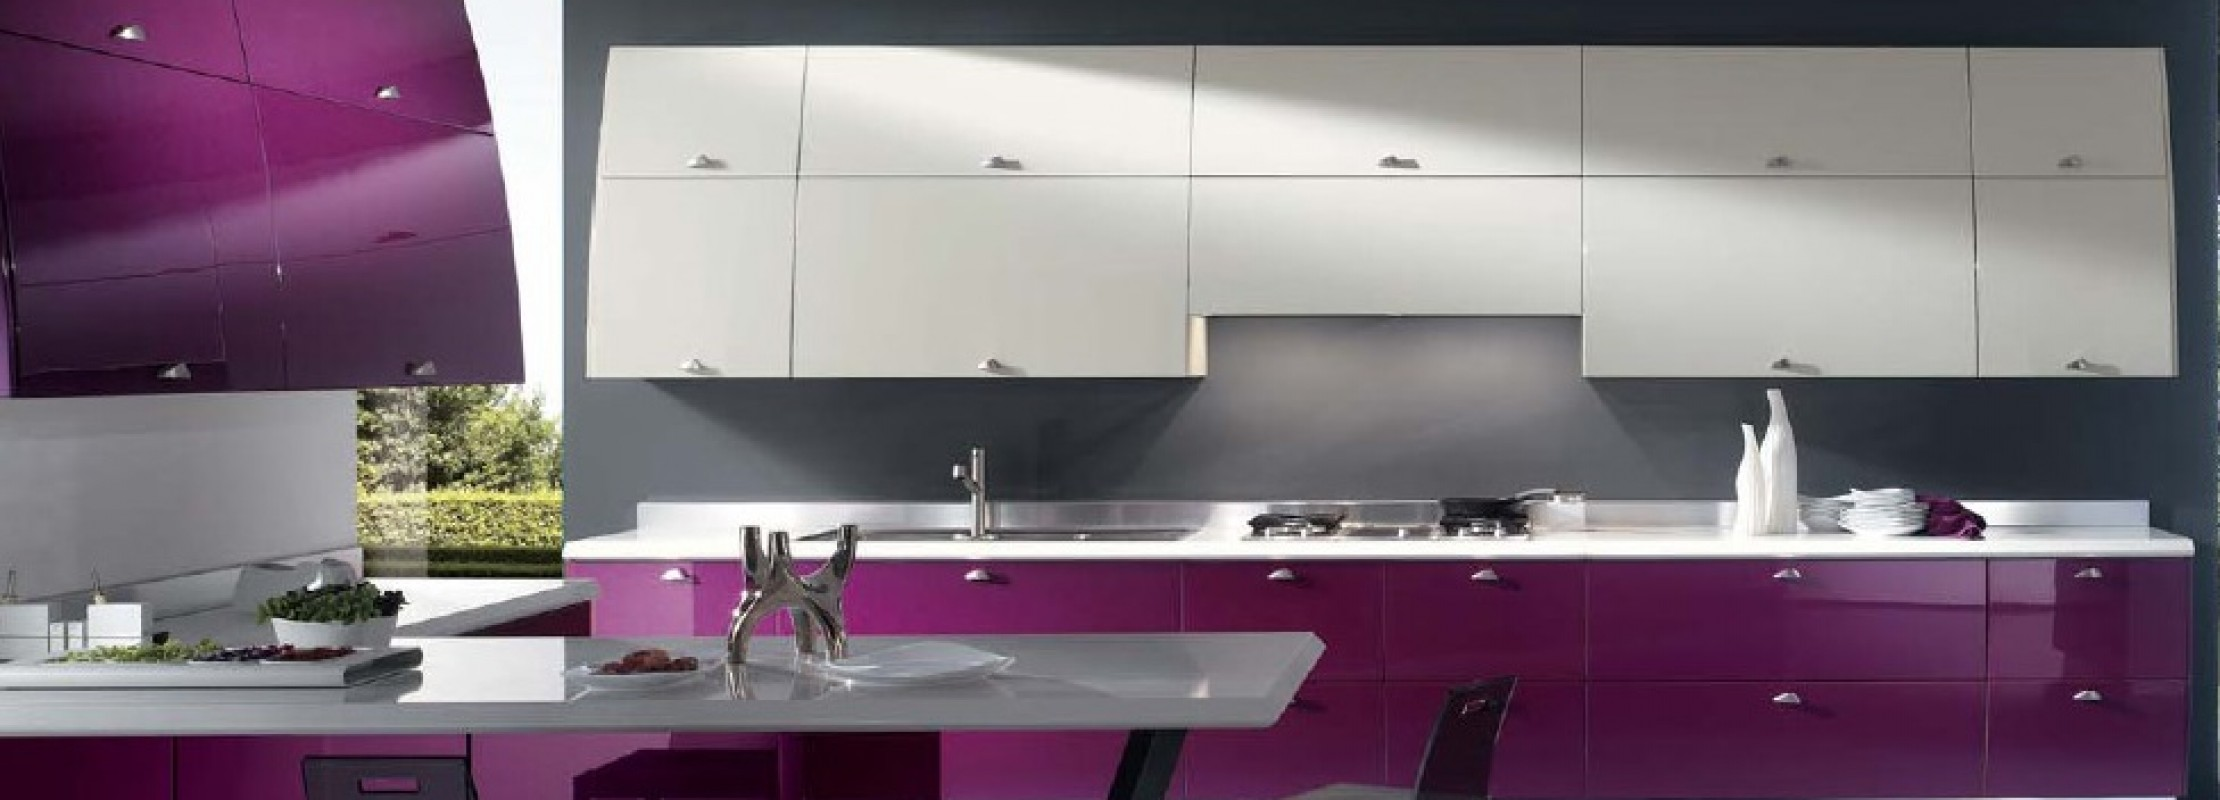 La cucina moderna, lineare ed elegante - | Blog Edilnet